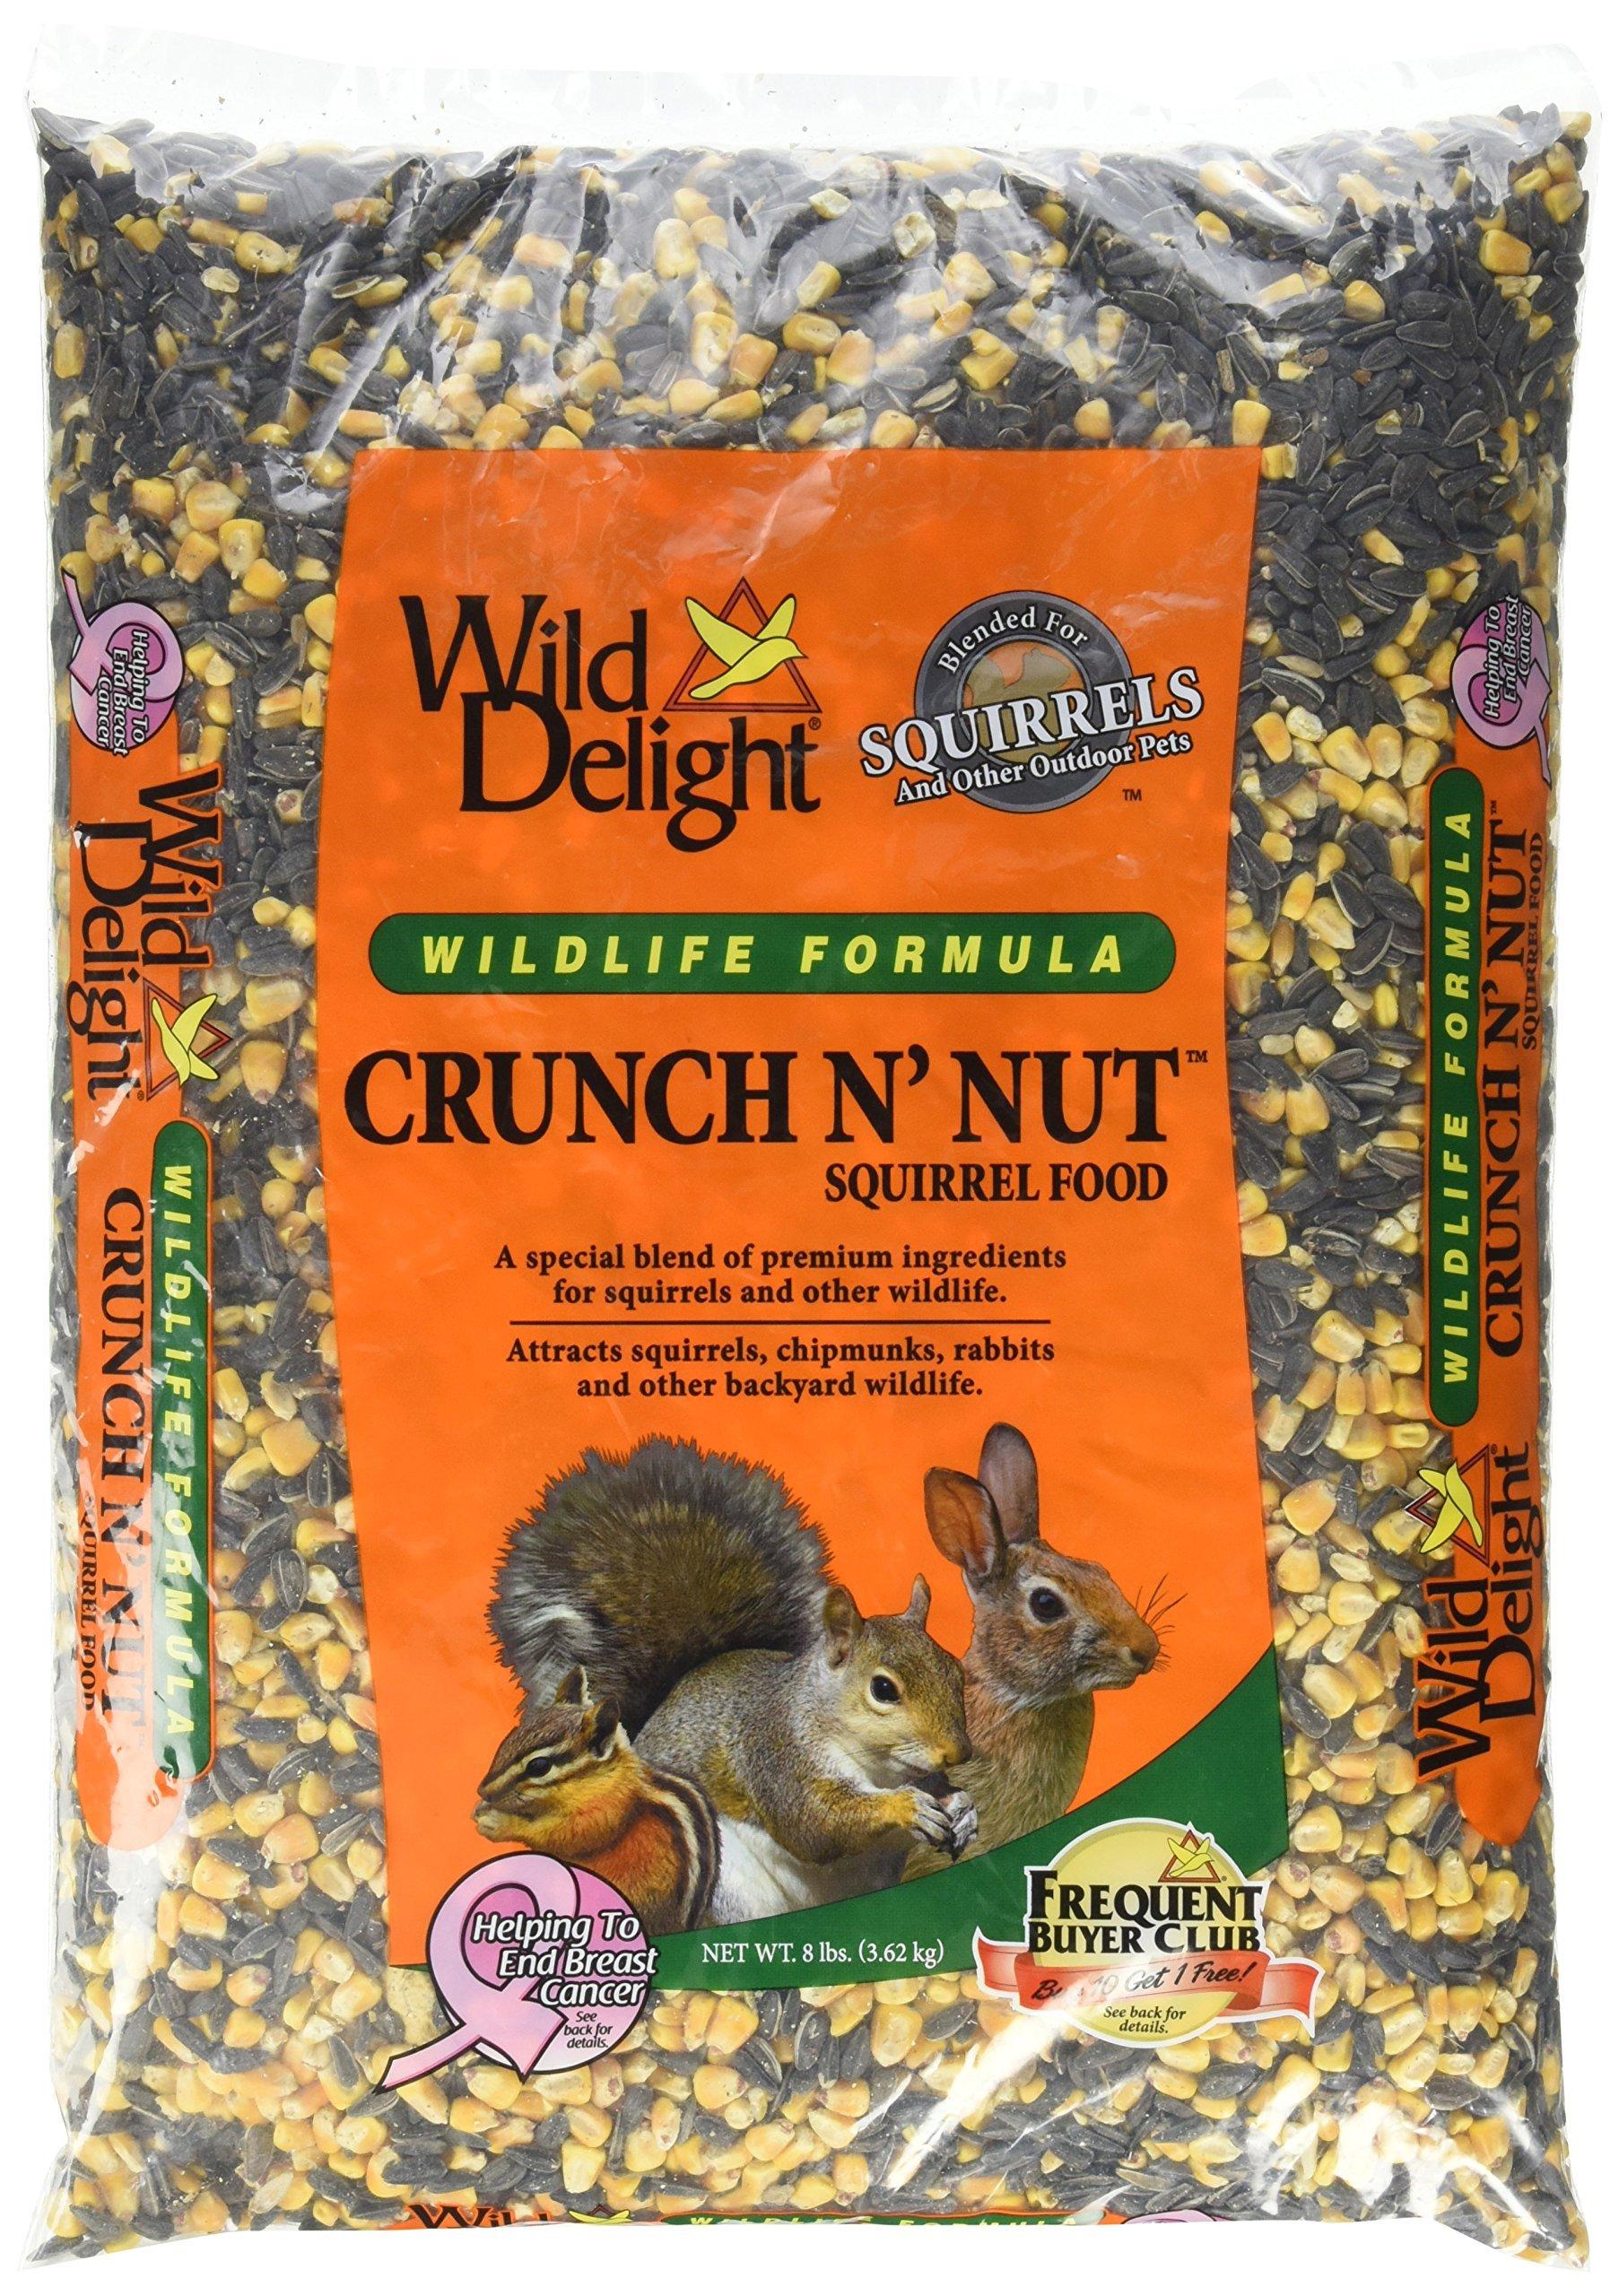 Wild Delight Crunch N' Nut Squirrel Food, 8 lb